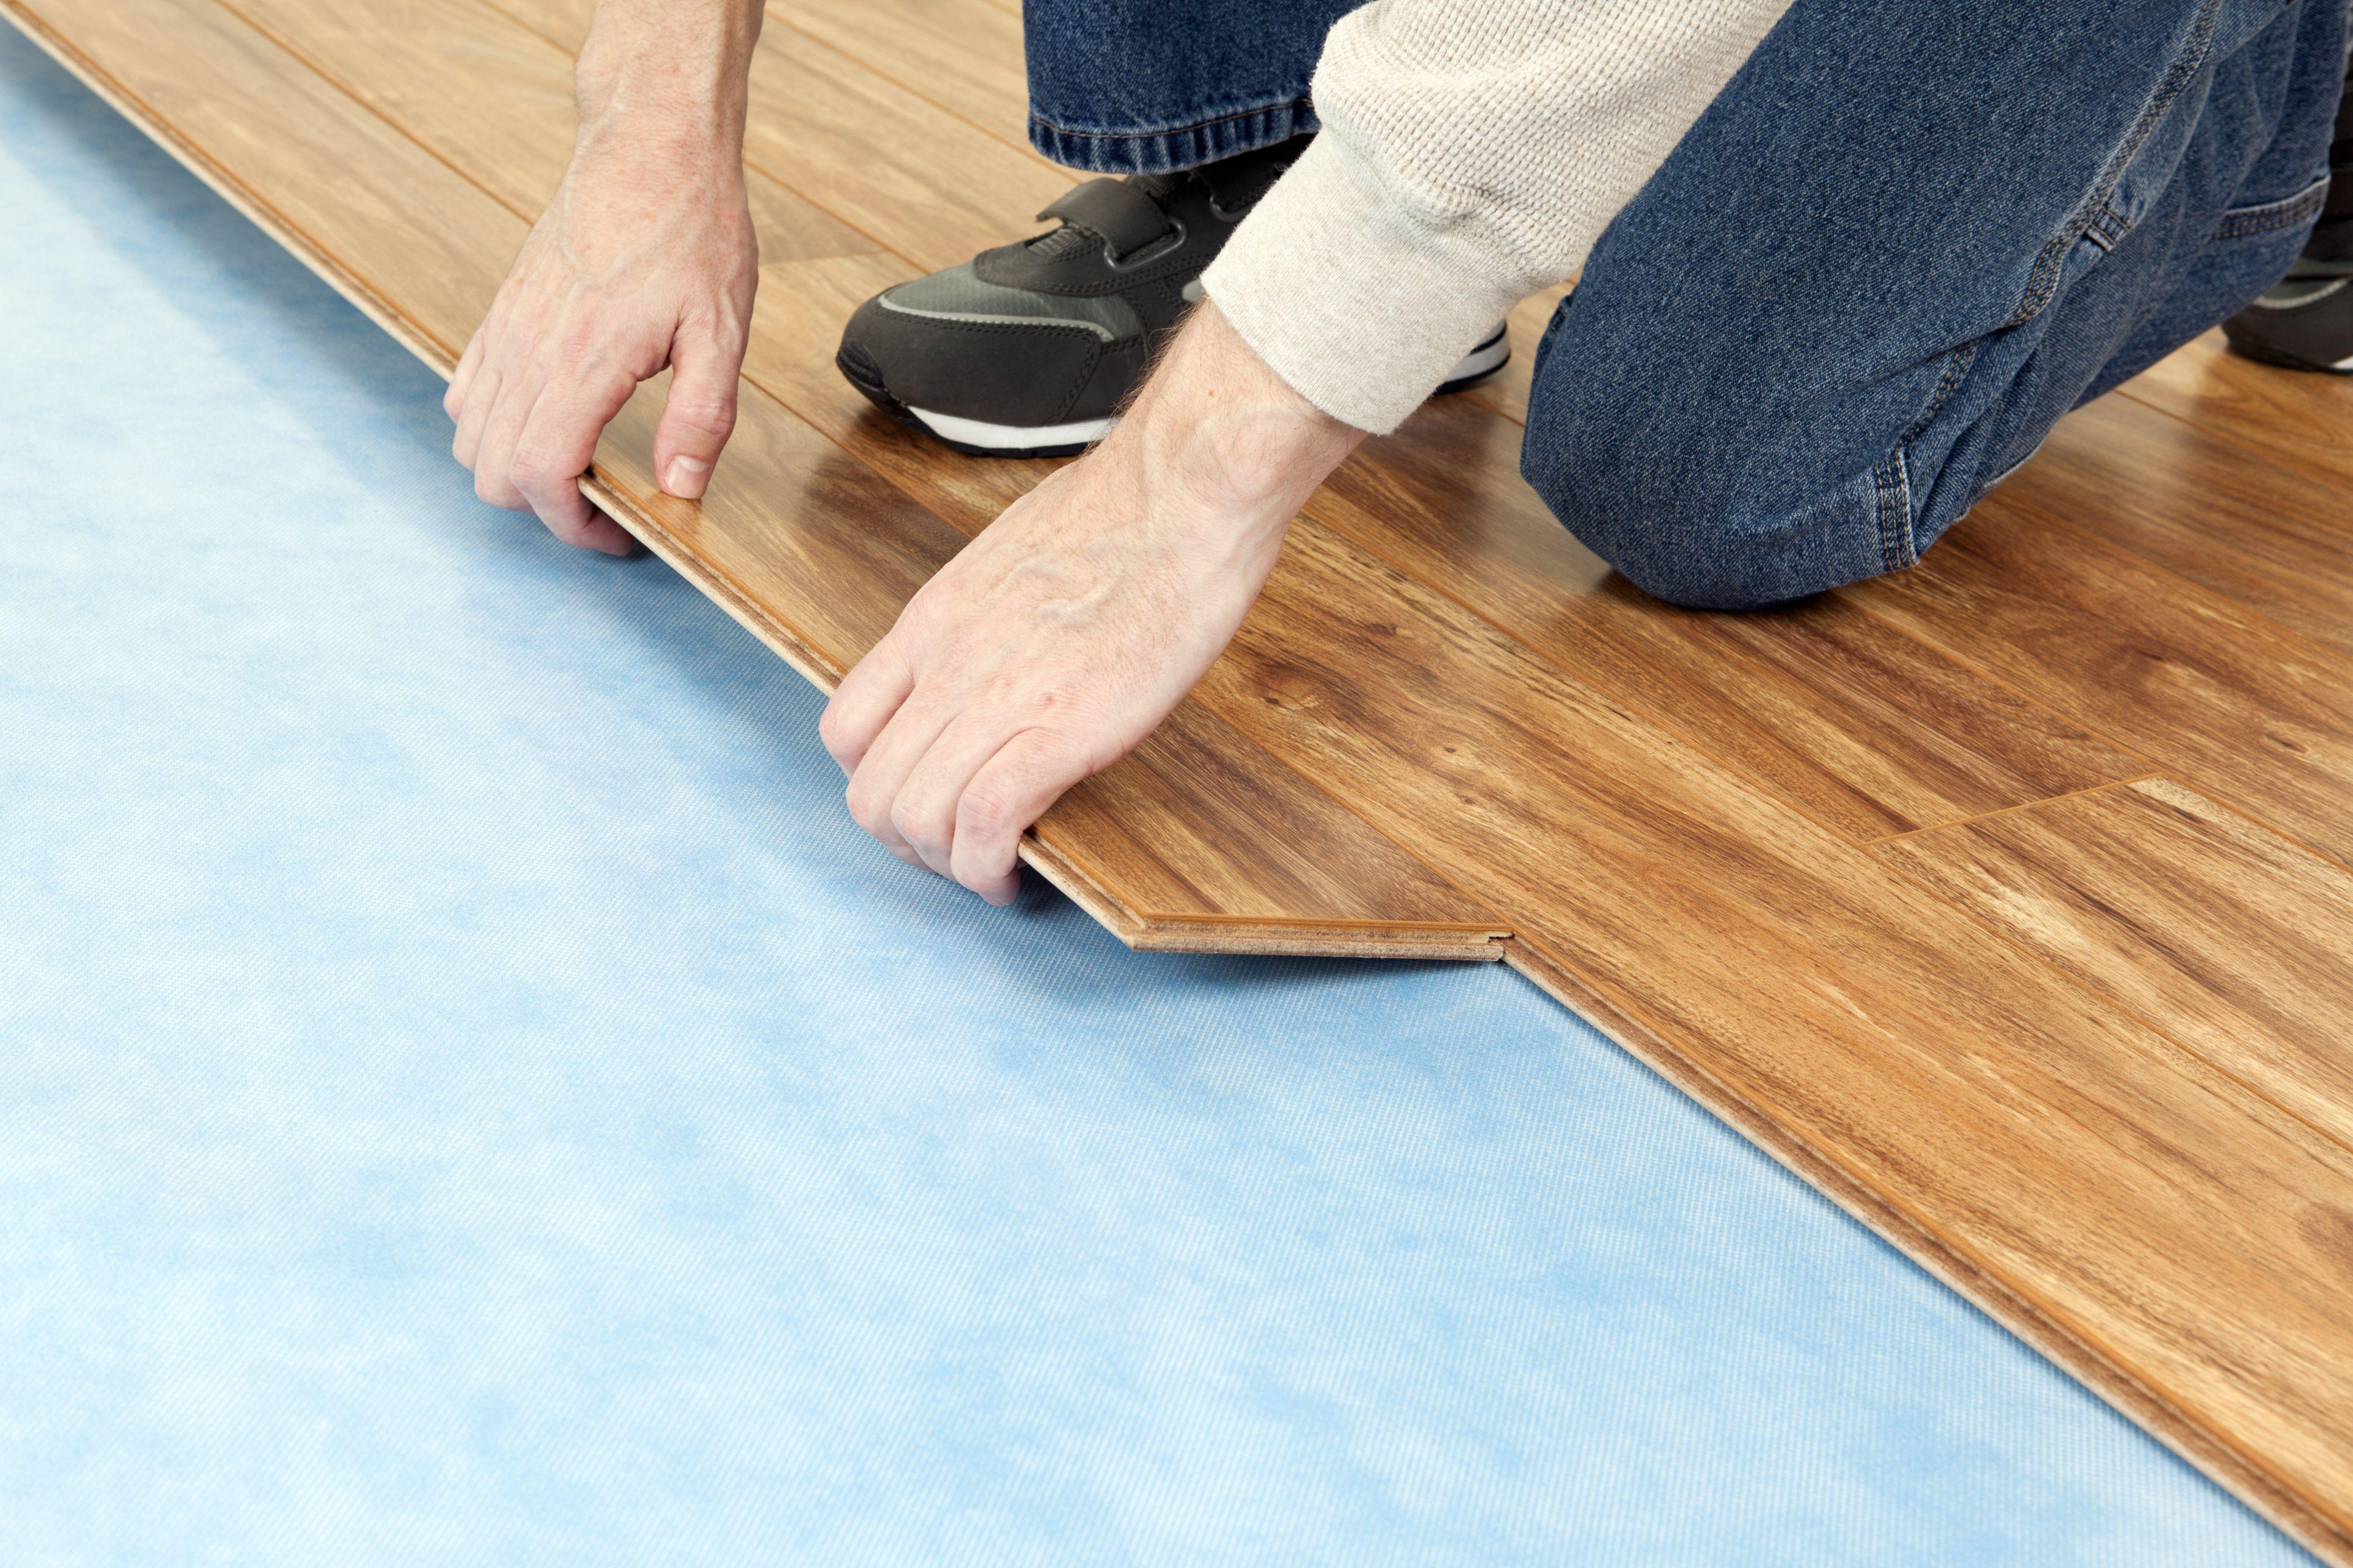 how do you install engineered hardwood floors on concrete of flooring underlayment the basics regarding new floor installation 185270632 582b722c3df78c6f6af0a8ab